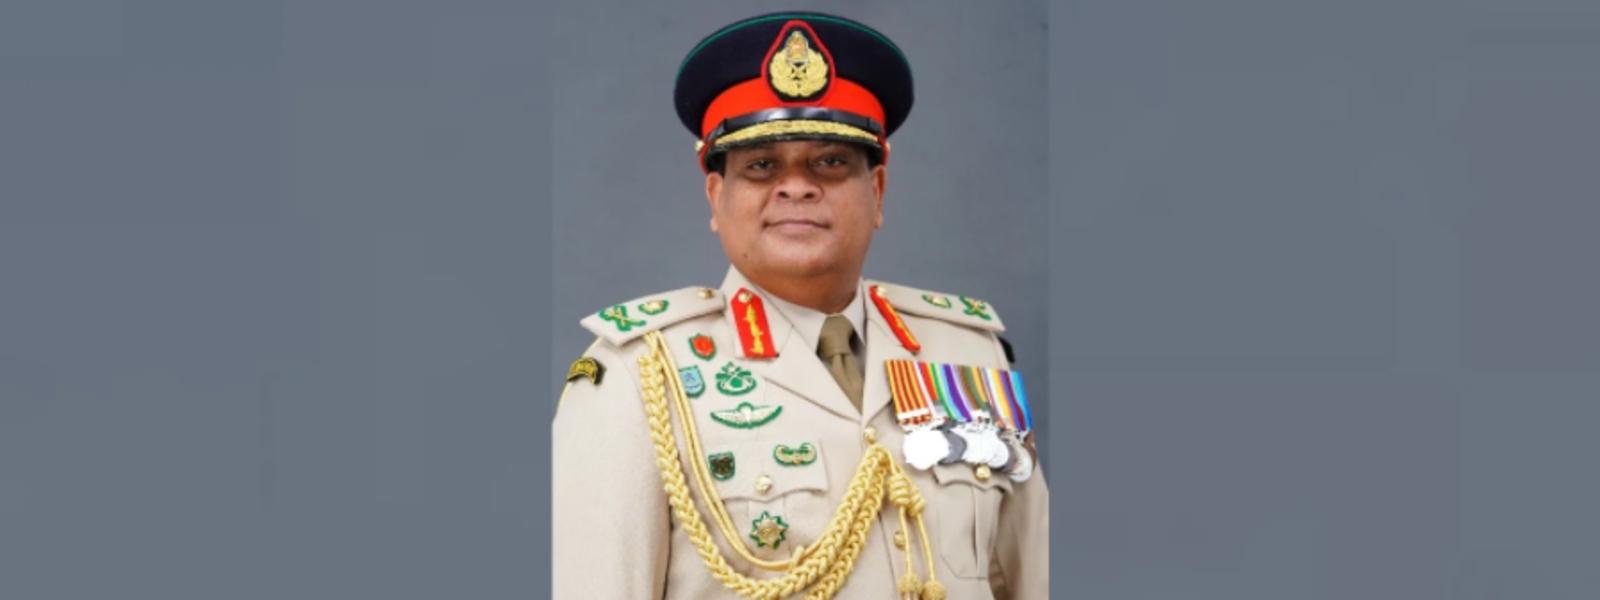 GoSL to conduct repatriation of Sri Lankans daily: Lt. Gen. Shavendra Silva